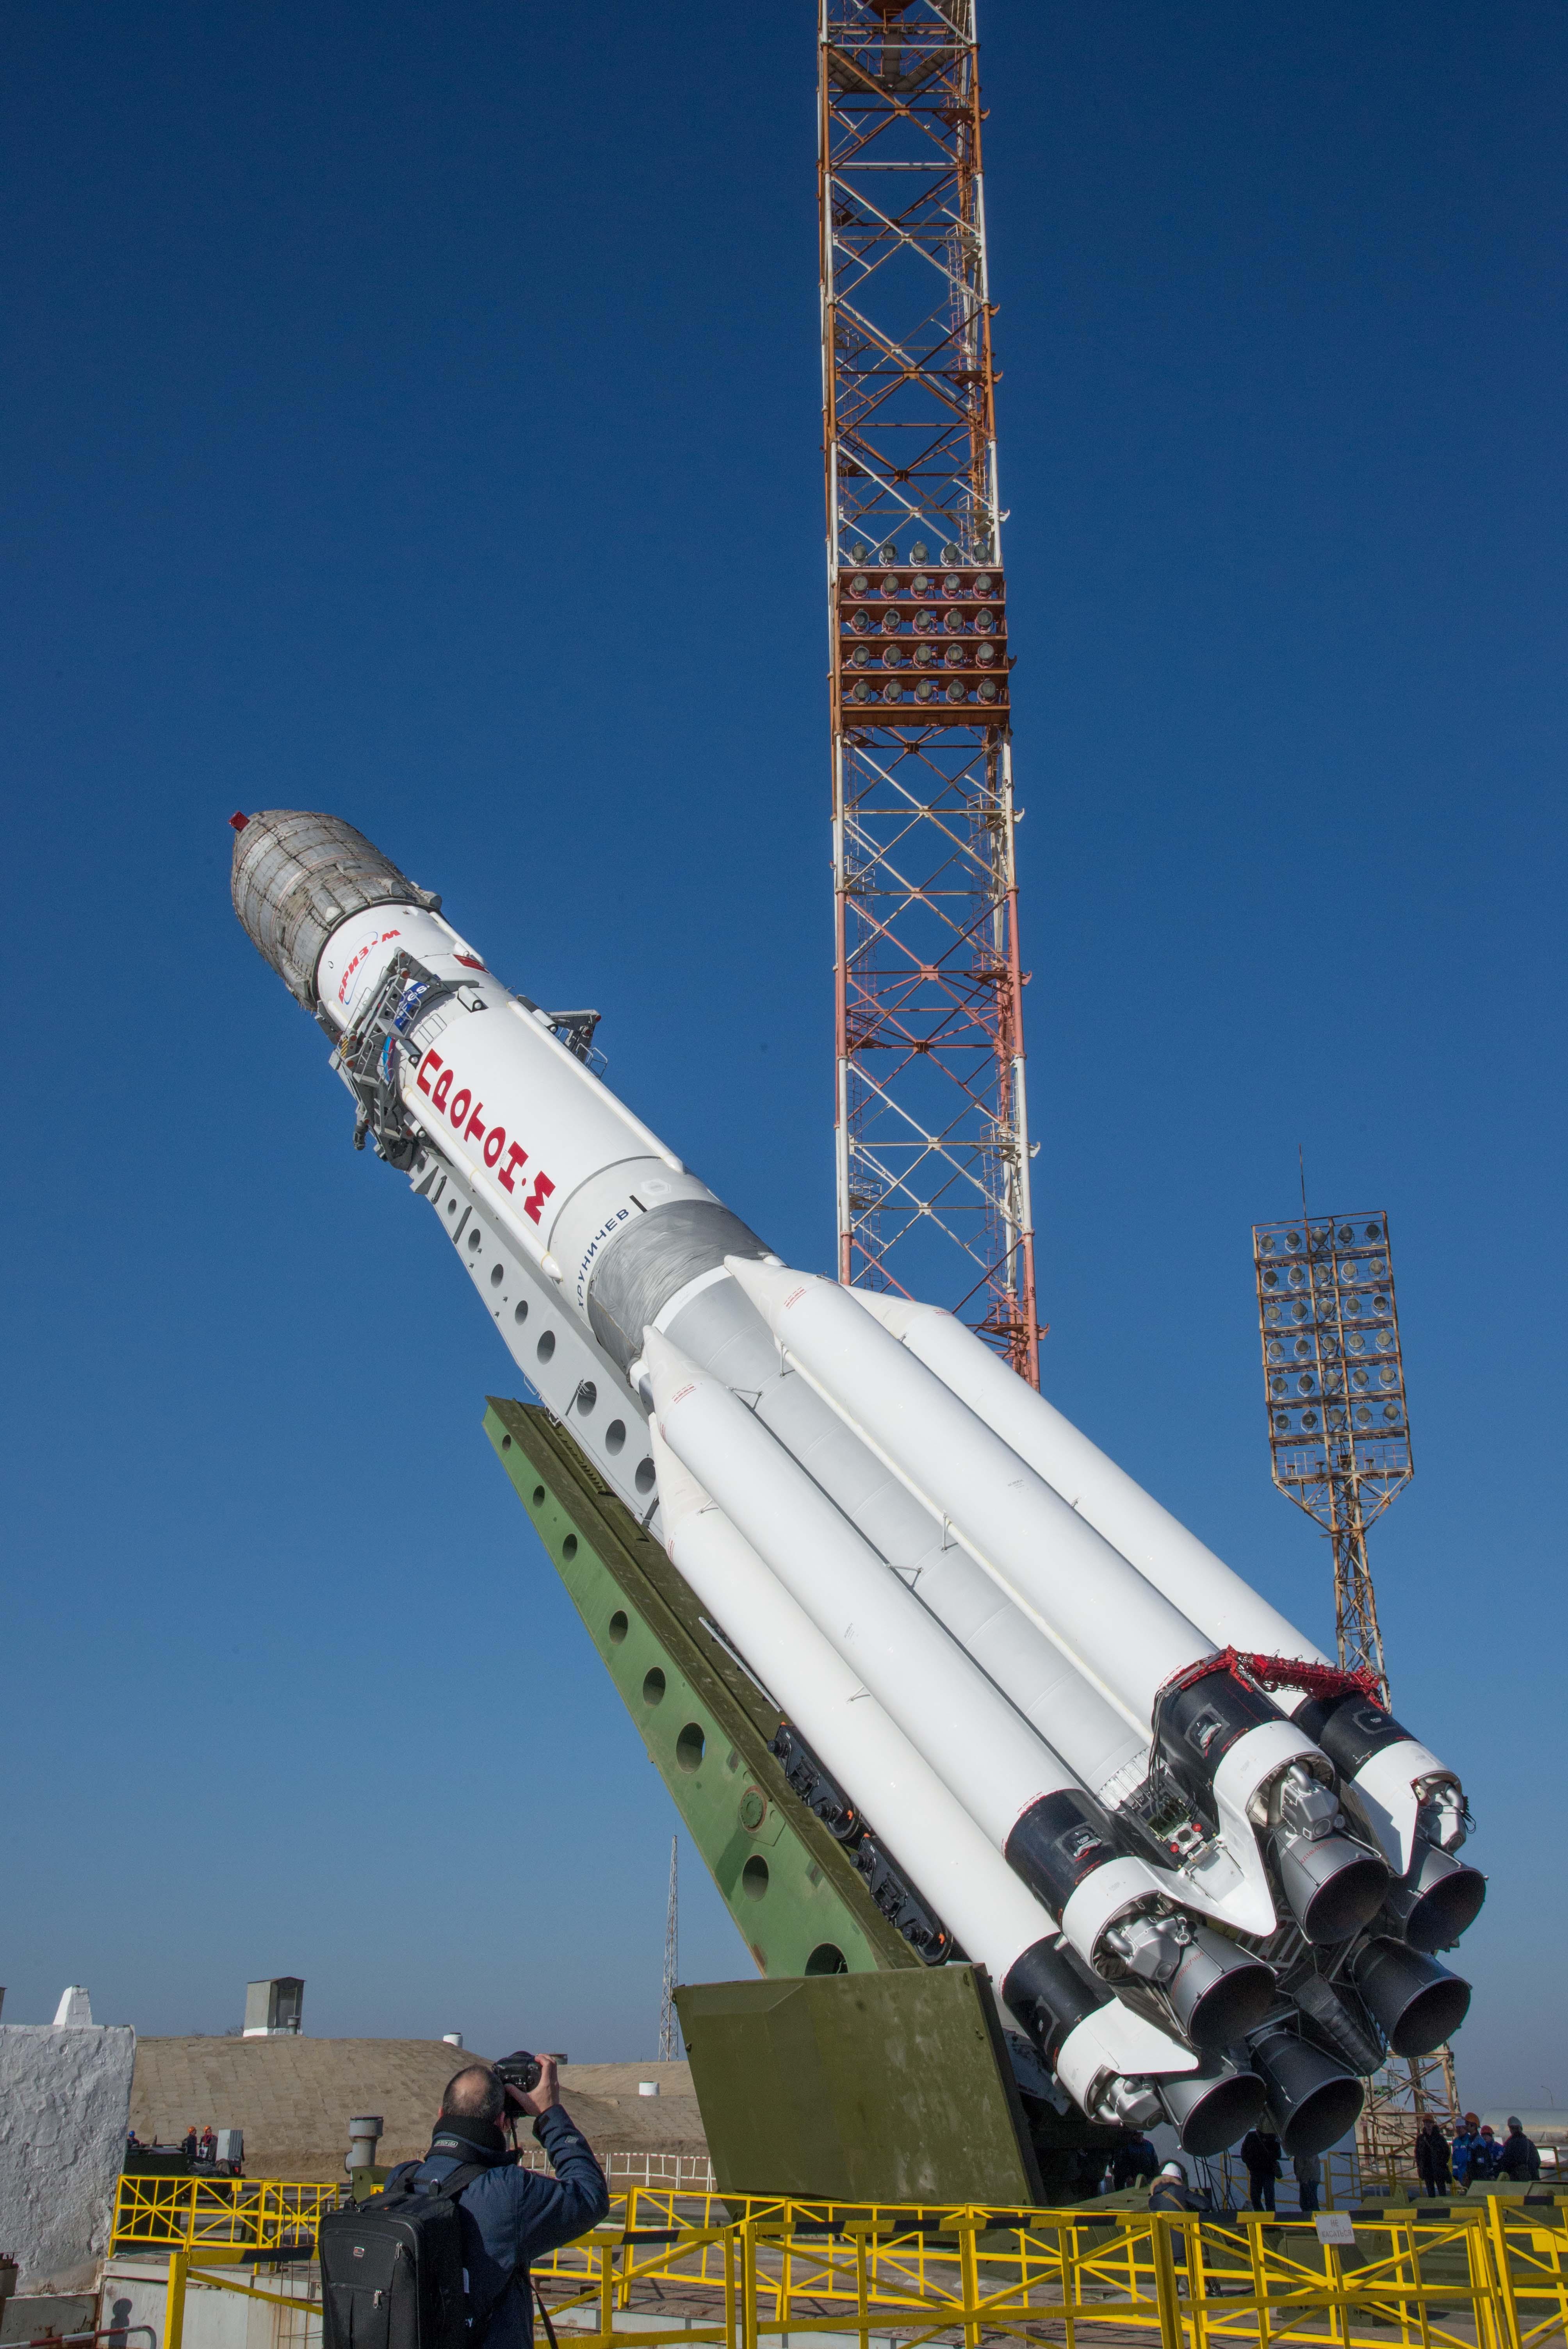 1567215225957-ExoMars2016_proton_launch_pad_160311-LC-AIT-24px.jpg